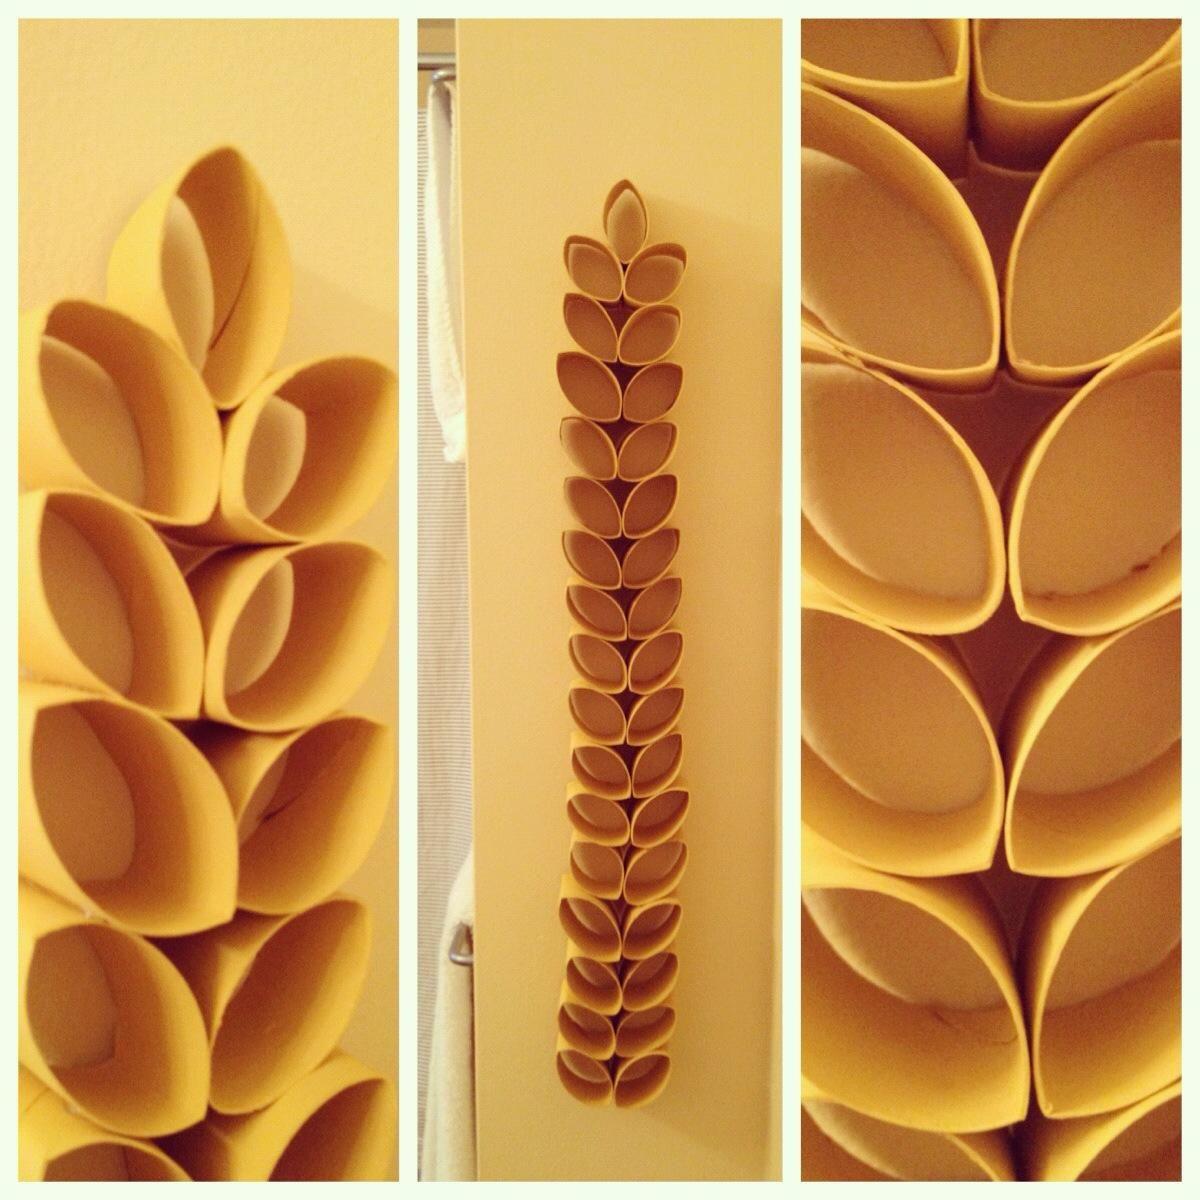 DIY Wall Art DIY Wall Art DIY Crafts DIY Home | DIY Wall Art ...